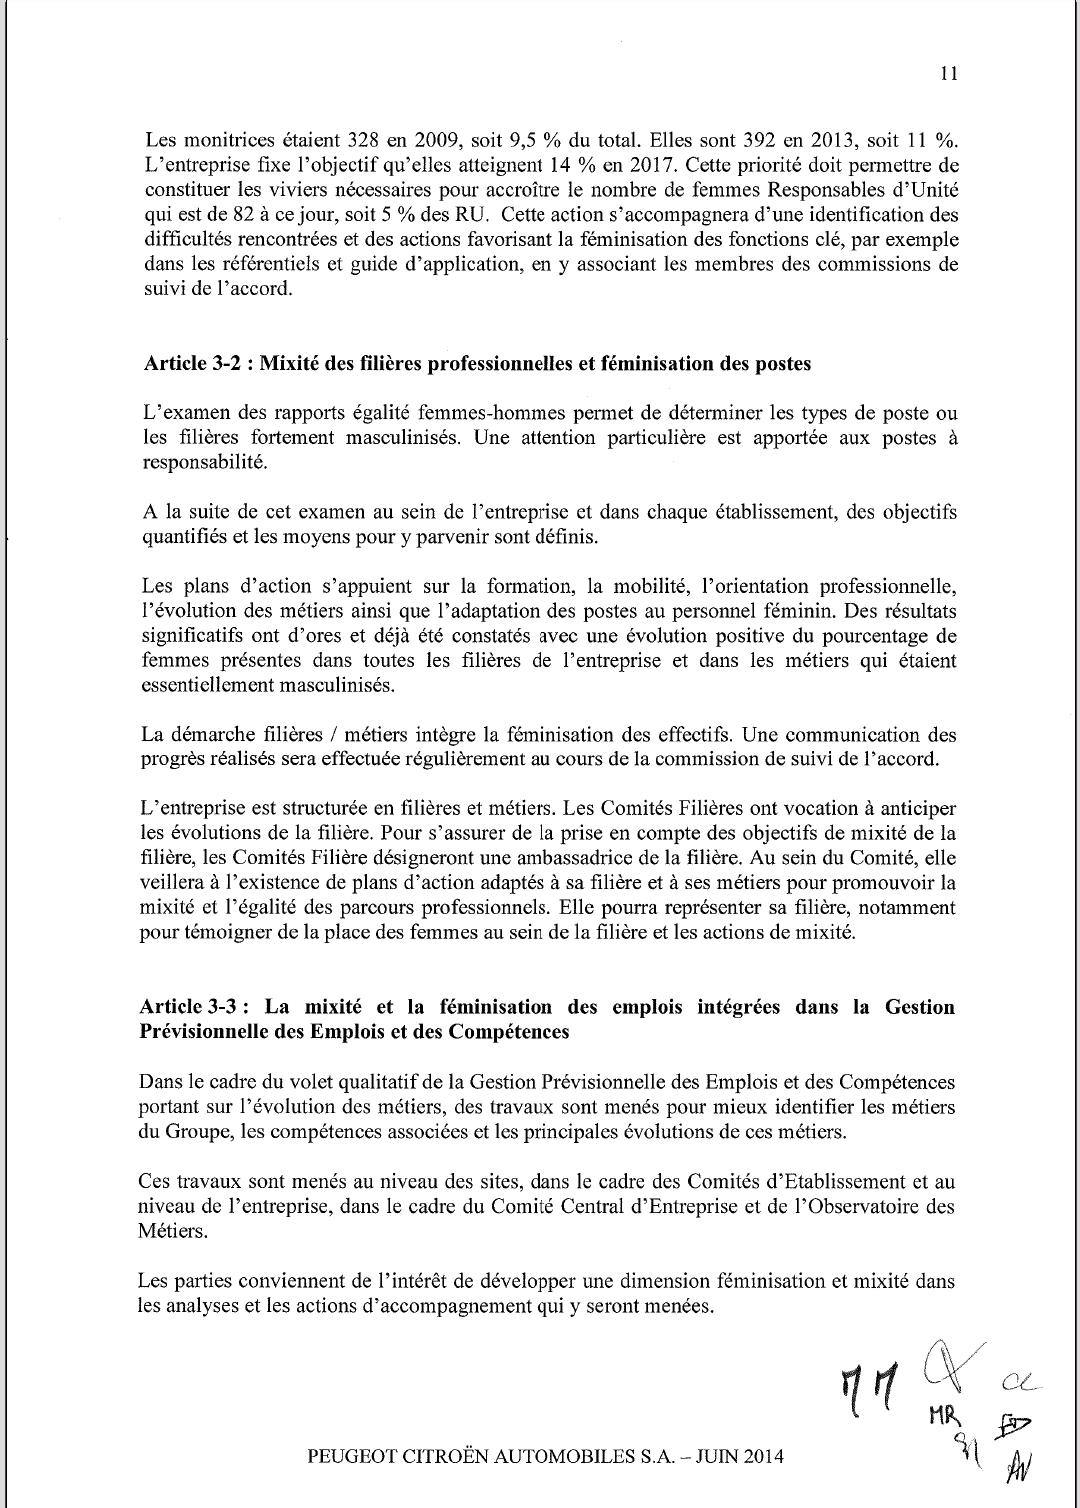 Accord11